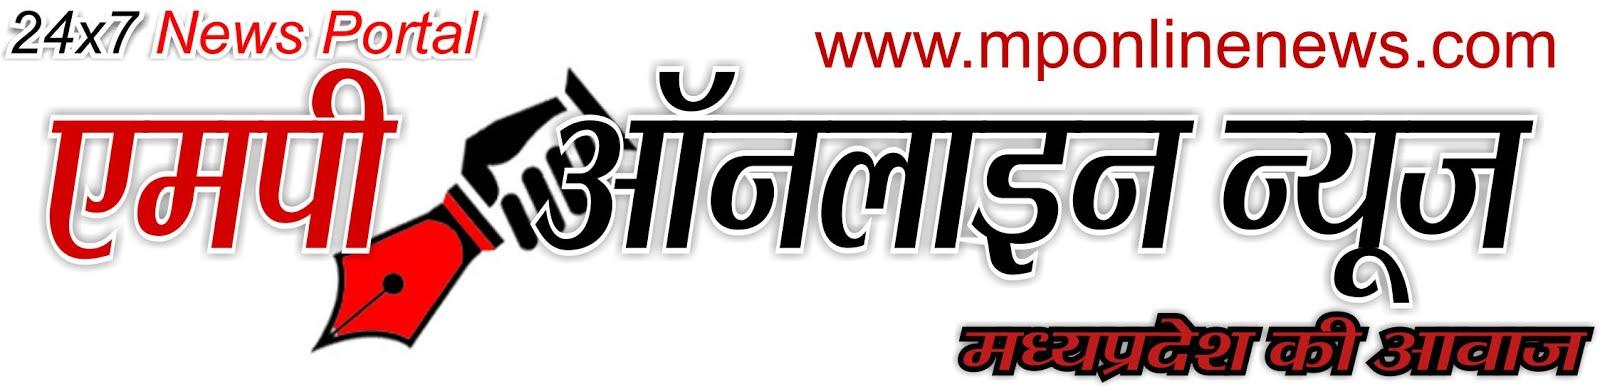 MP Hindi News (मध्य प्रदेश न्यूज़):MP News in Hindi | मध्य प्रदेश समाचार | Madhya Pradesh News in Hi